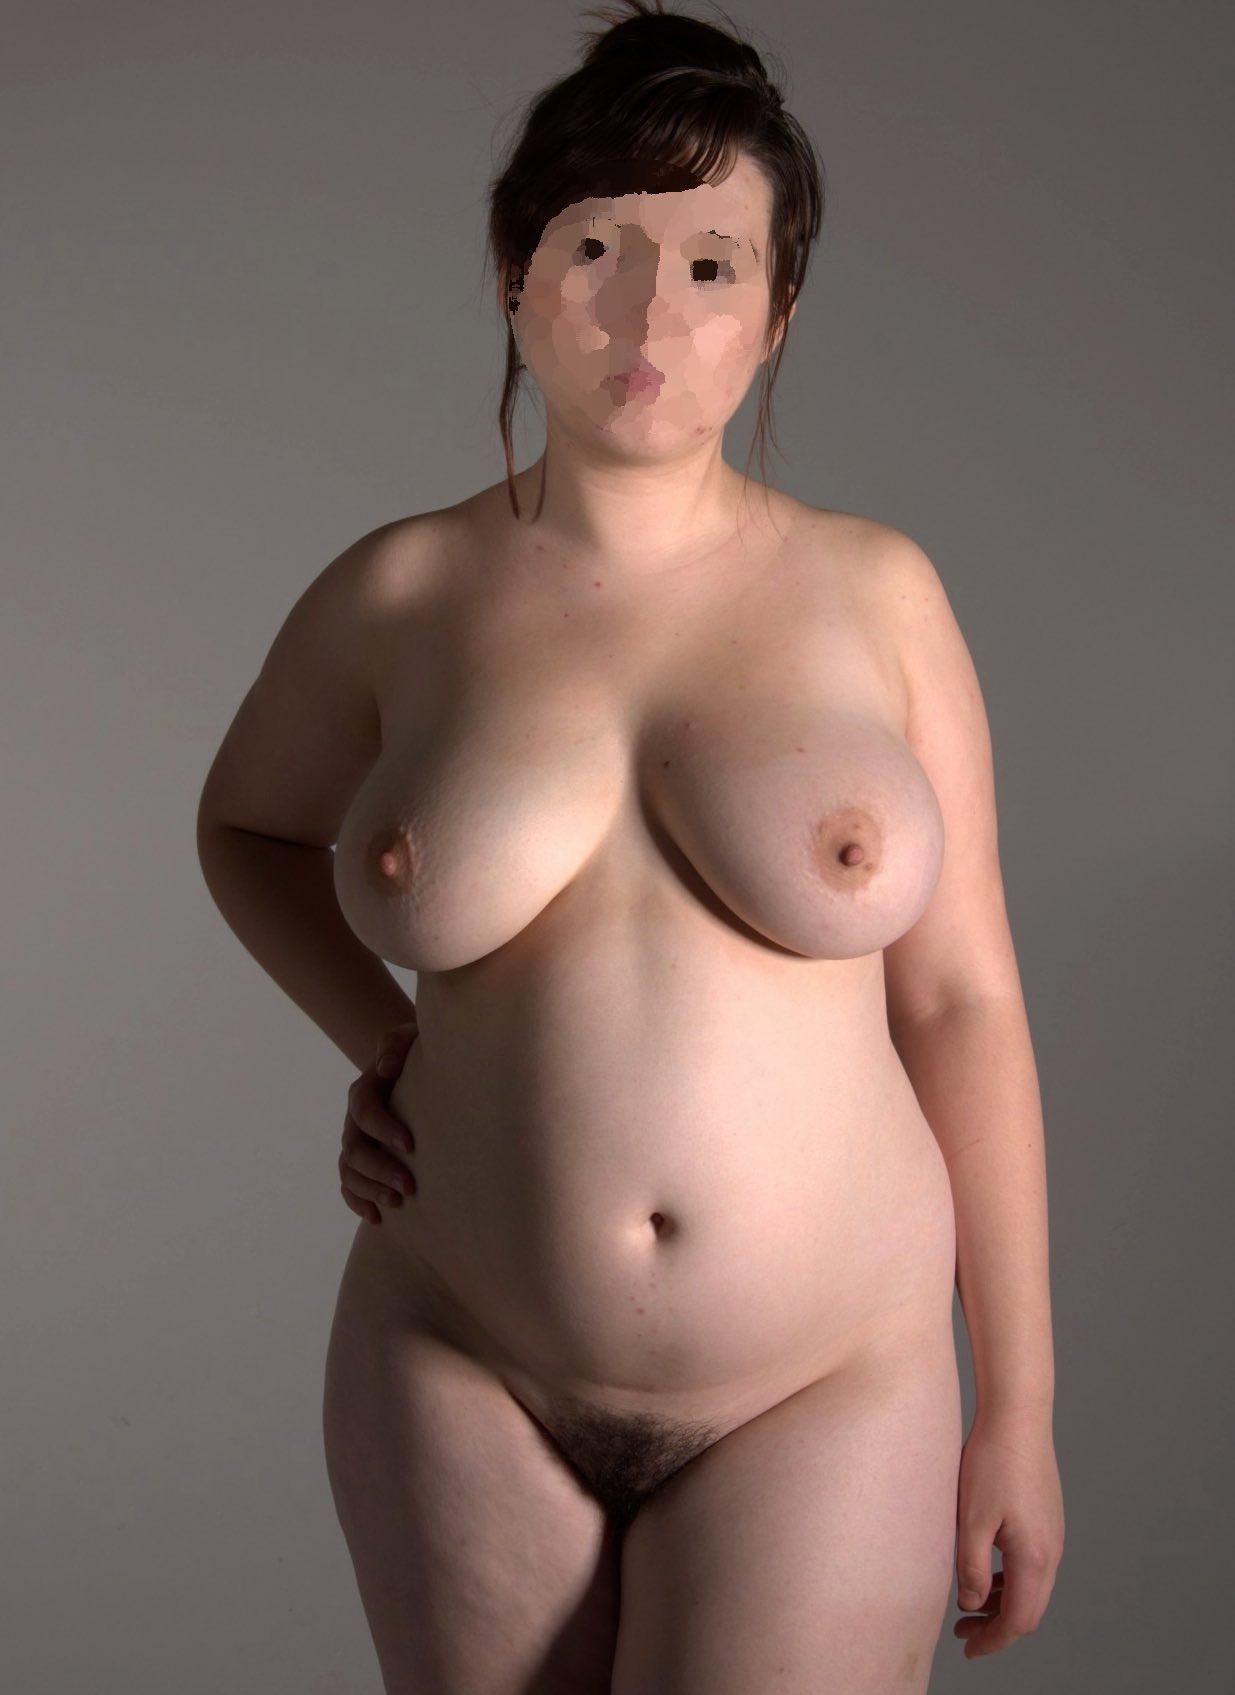 Les gros seins d'une grosse coquine